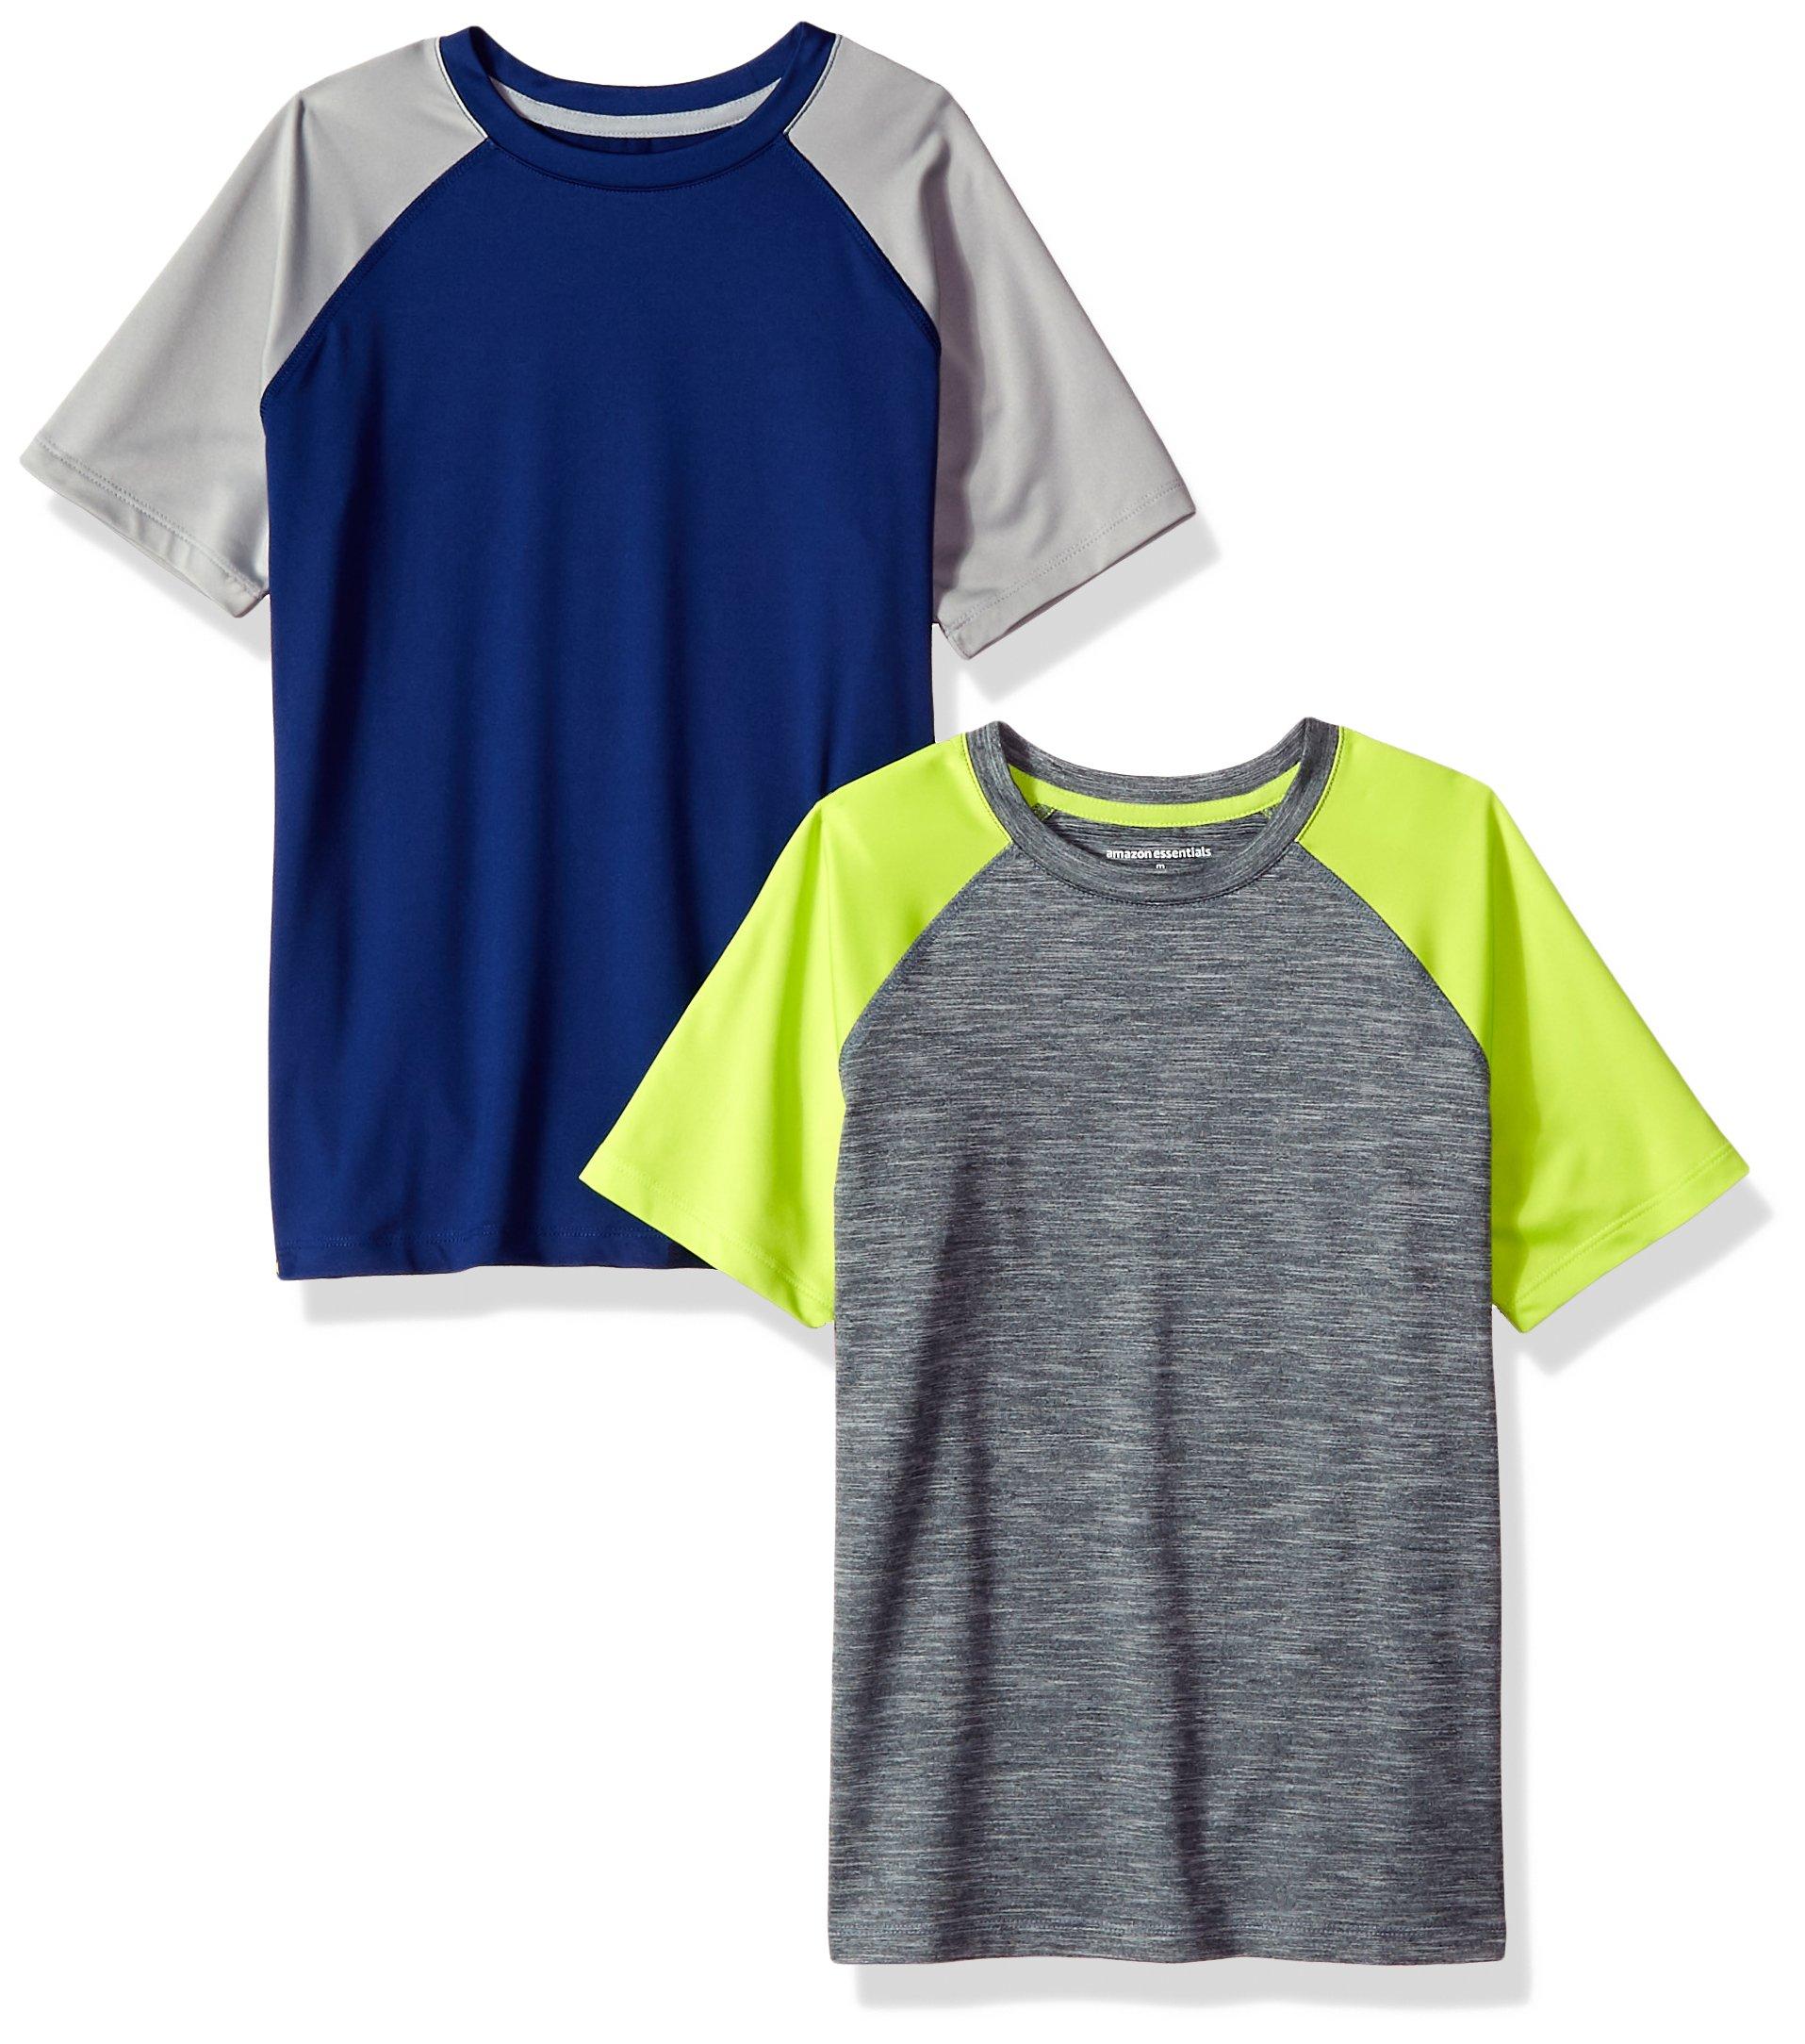 Amazon Essentials Boys' 2-Pack Short-Sleeve Raglan Active Tee, Navy/Grey/Grey/Lime, Large